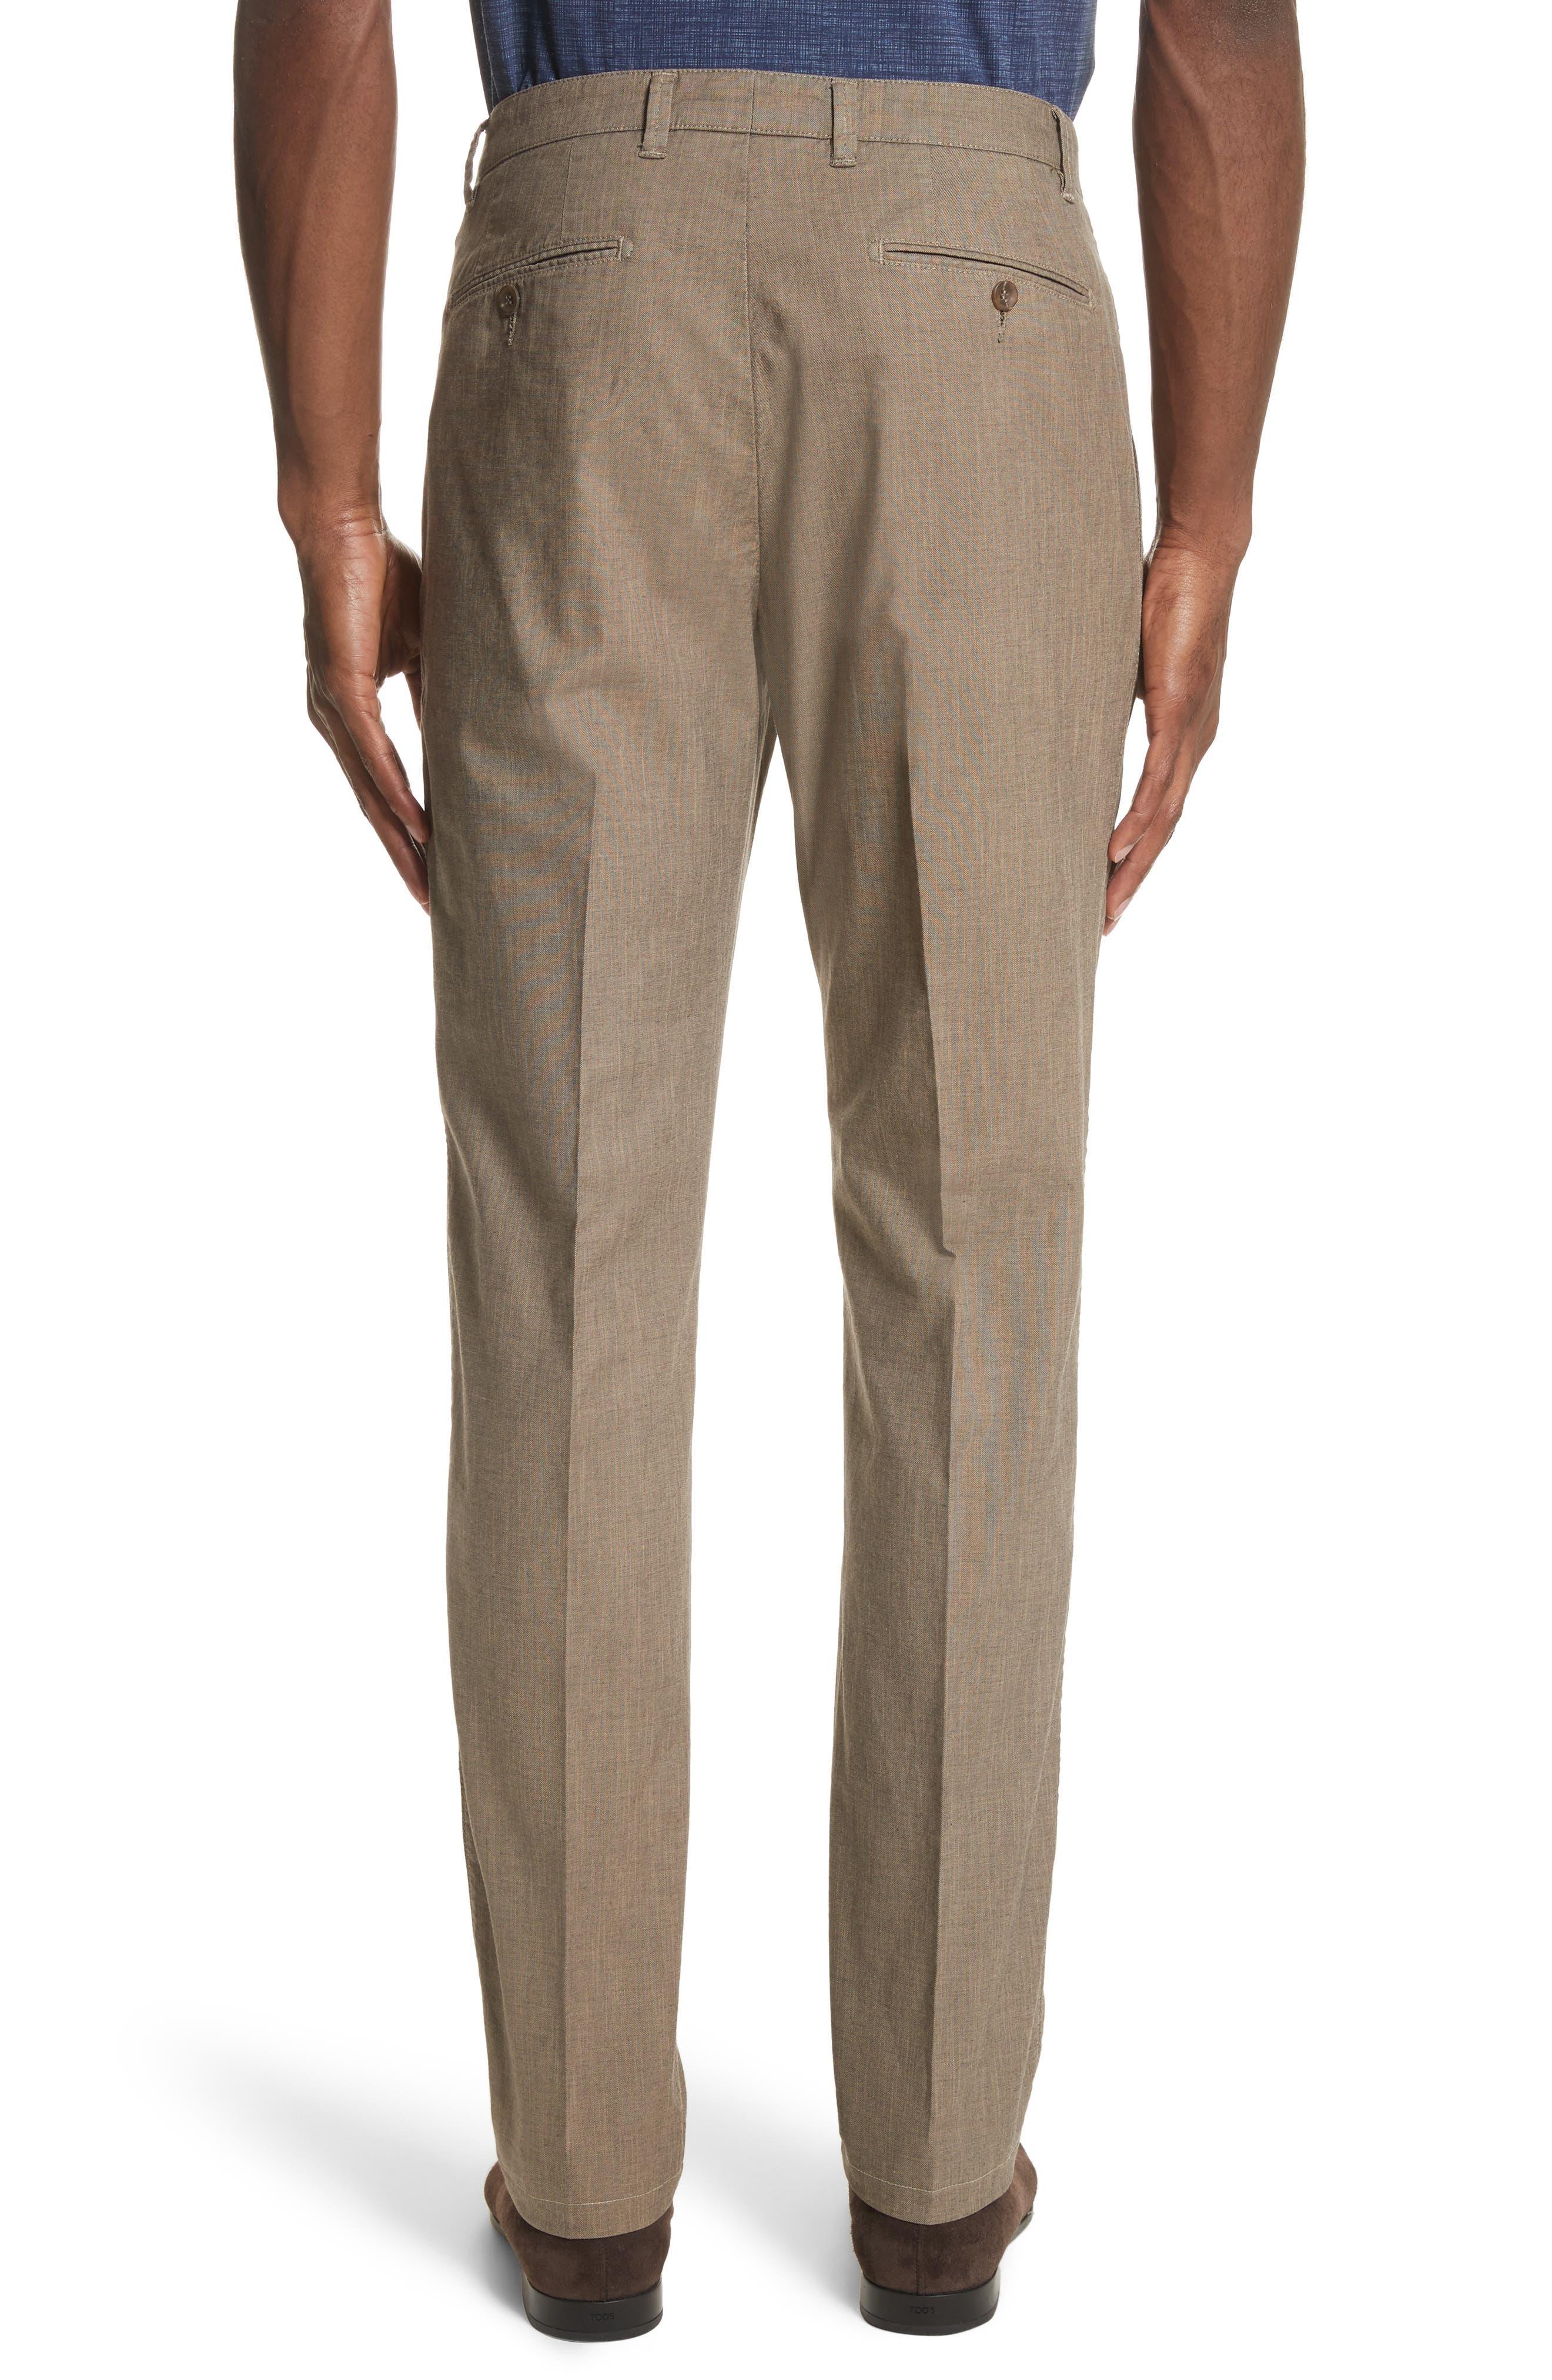 French Pocket Stretch Straight Leg Pants,                             Alternate thumbnail 2, color,                             Dark Beige